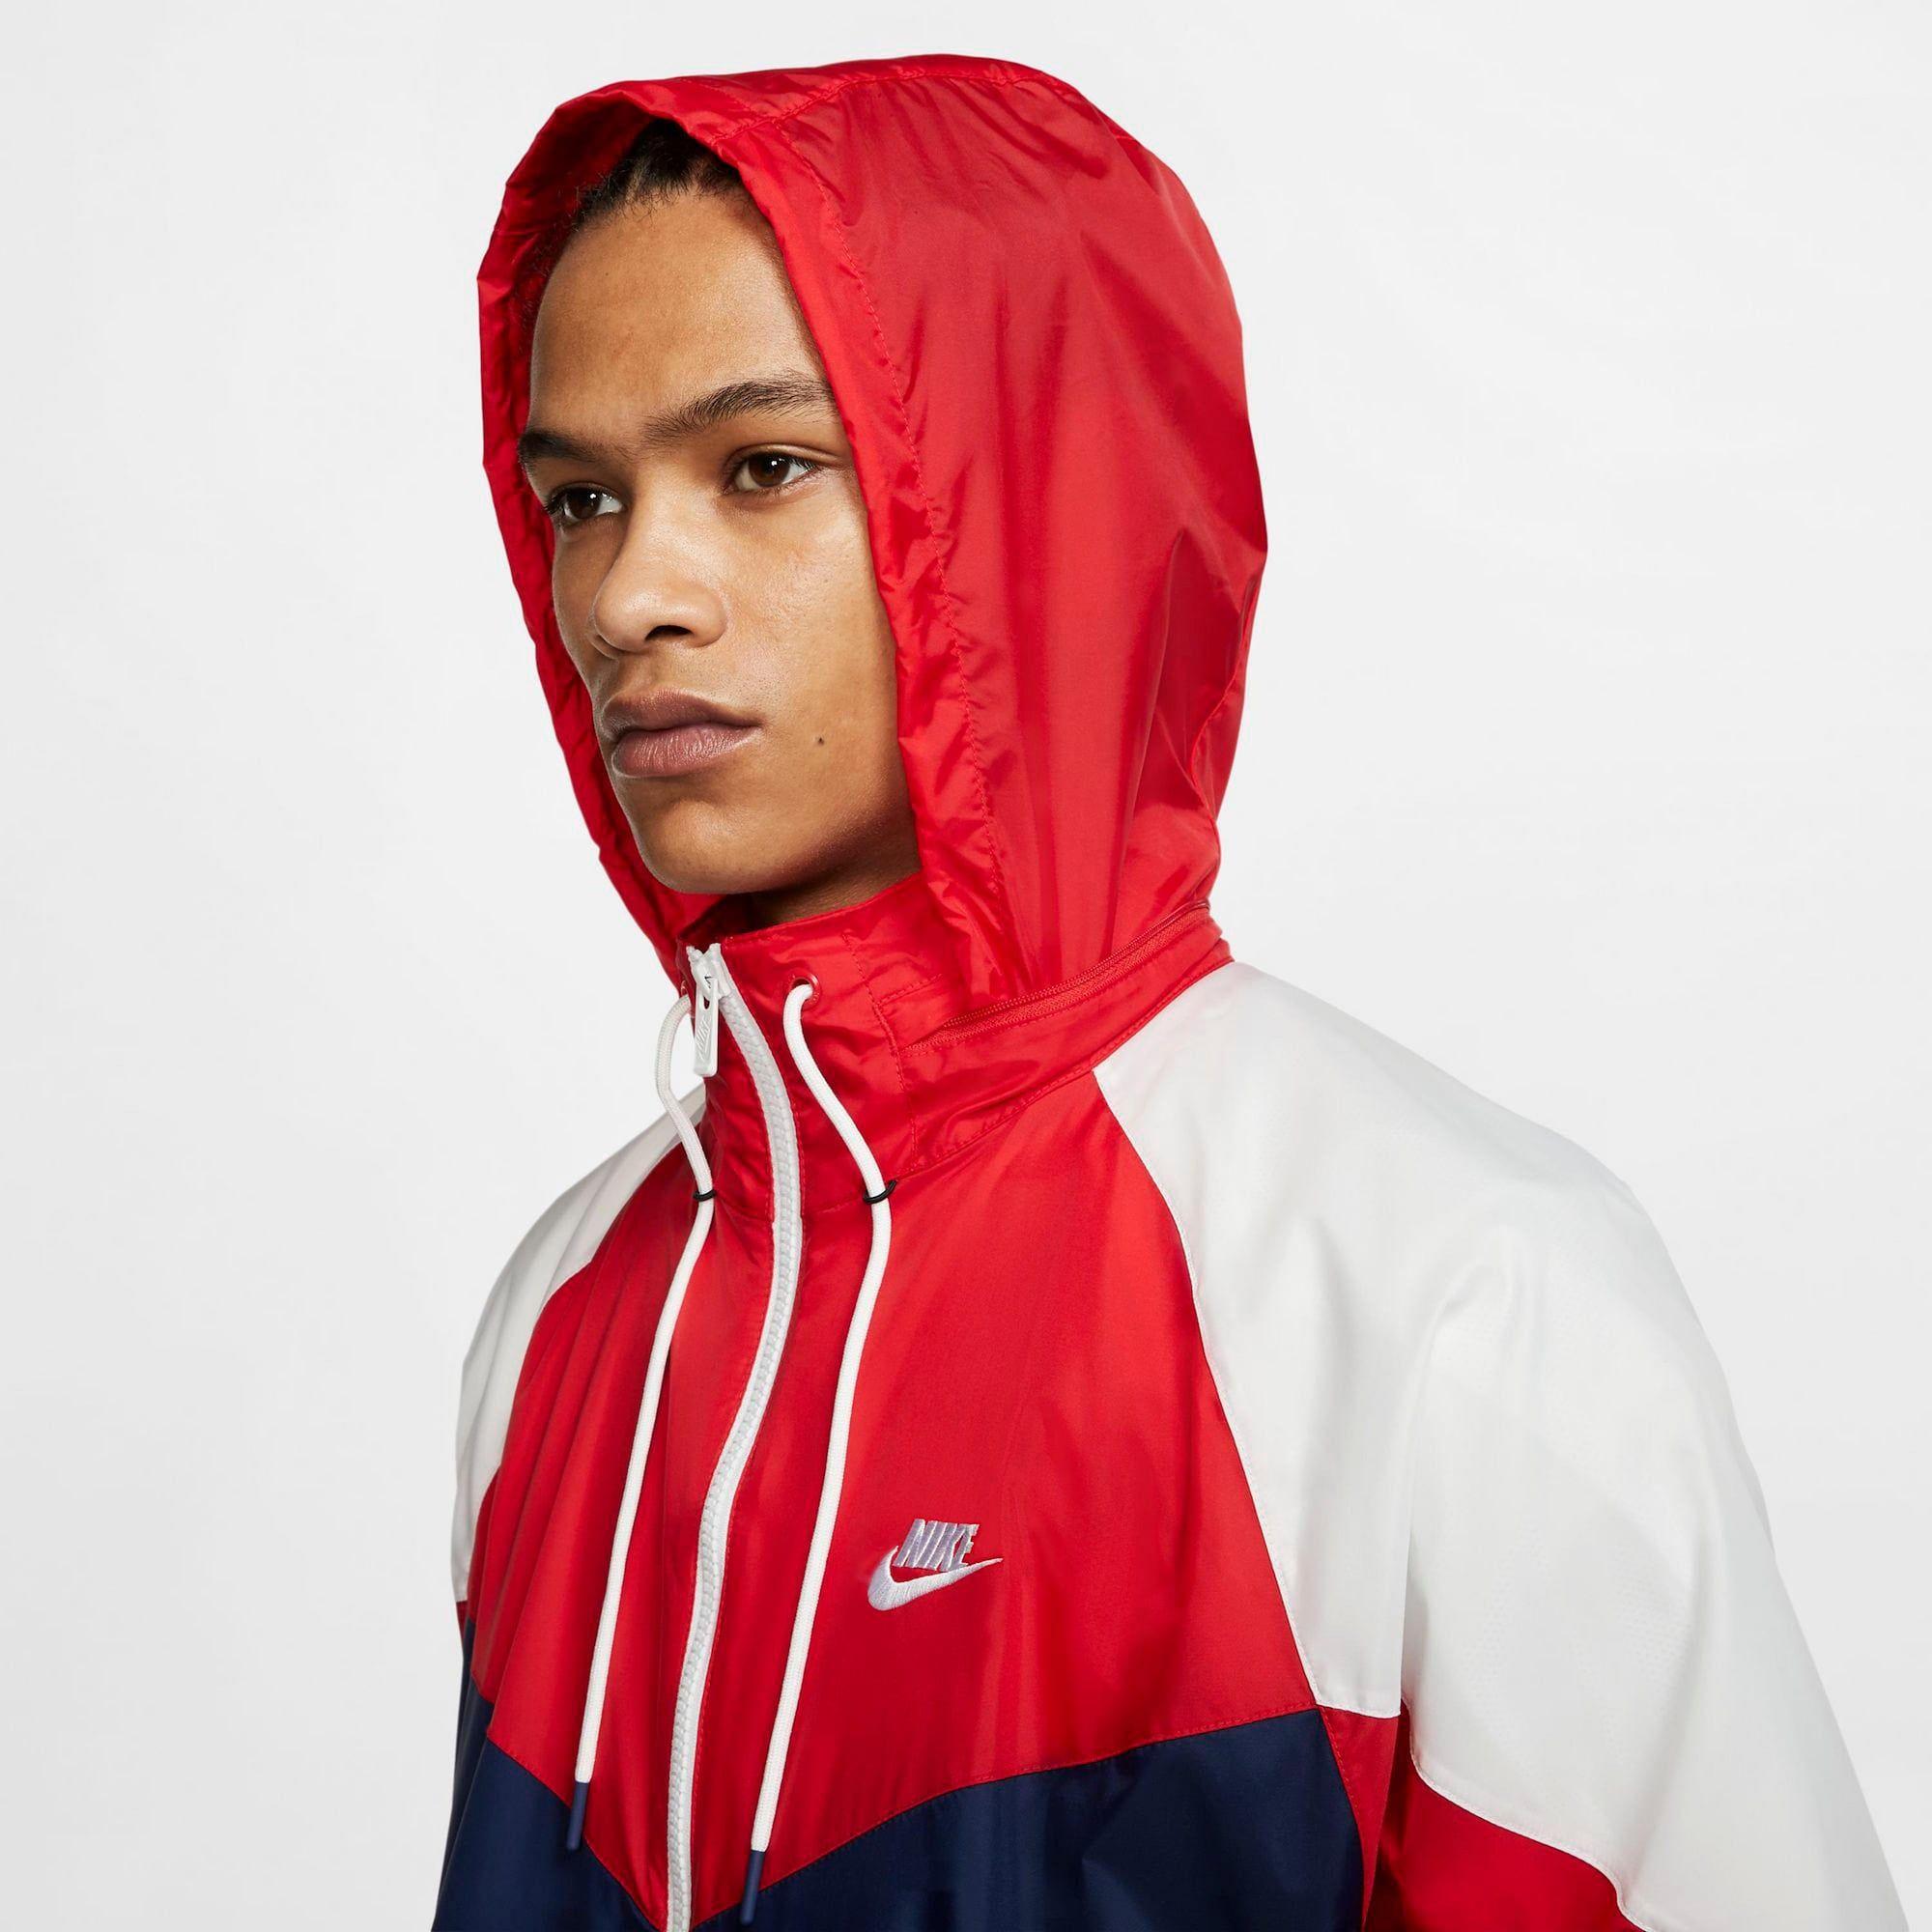 Nike Sportswear Windrunner Herren, Kobaltblau Rot, Größe M